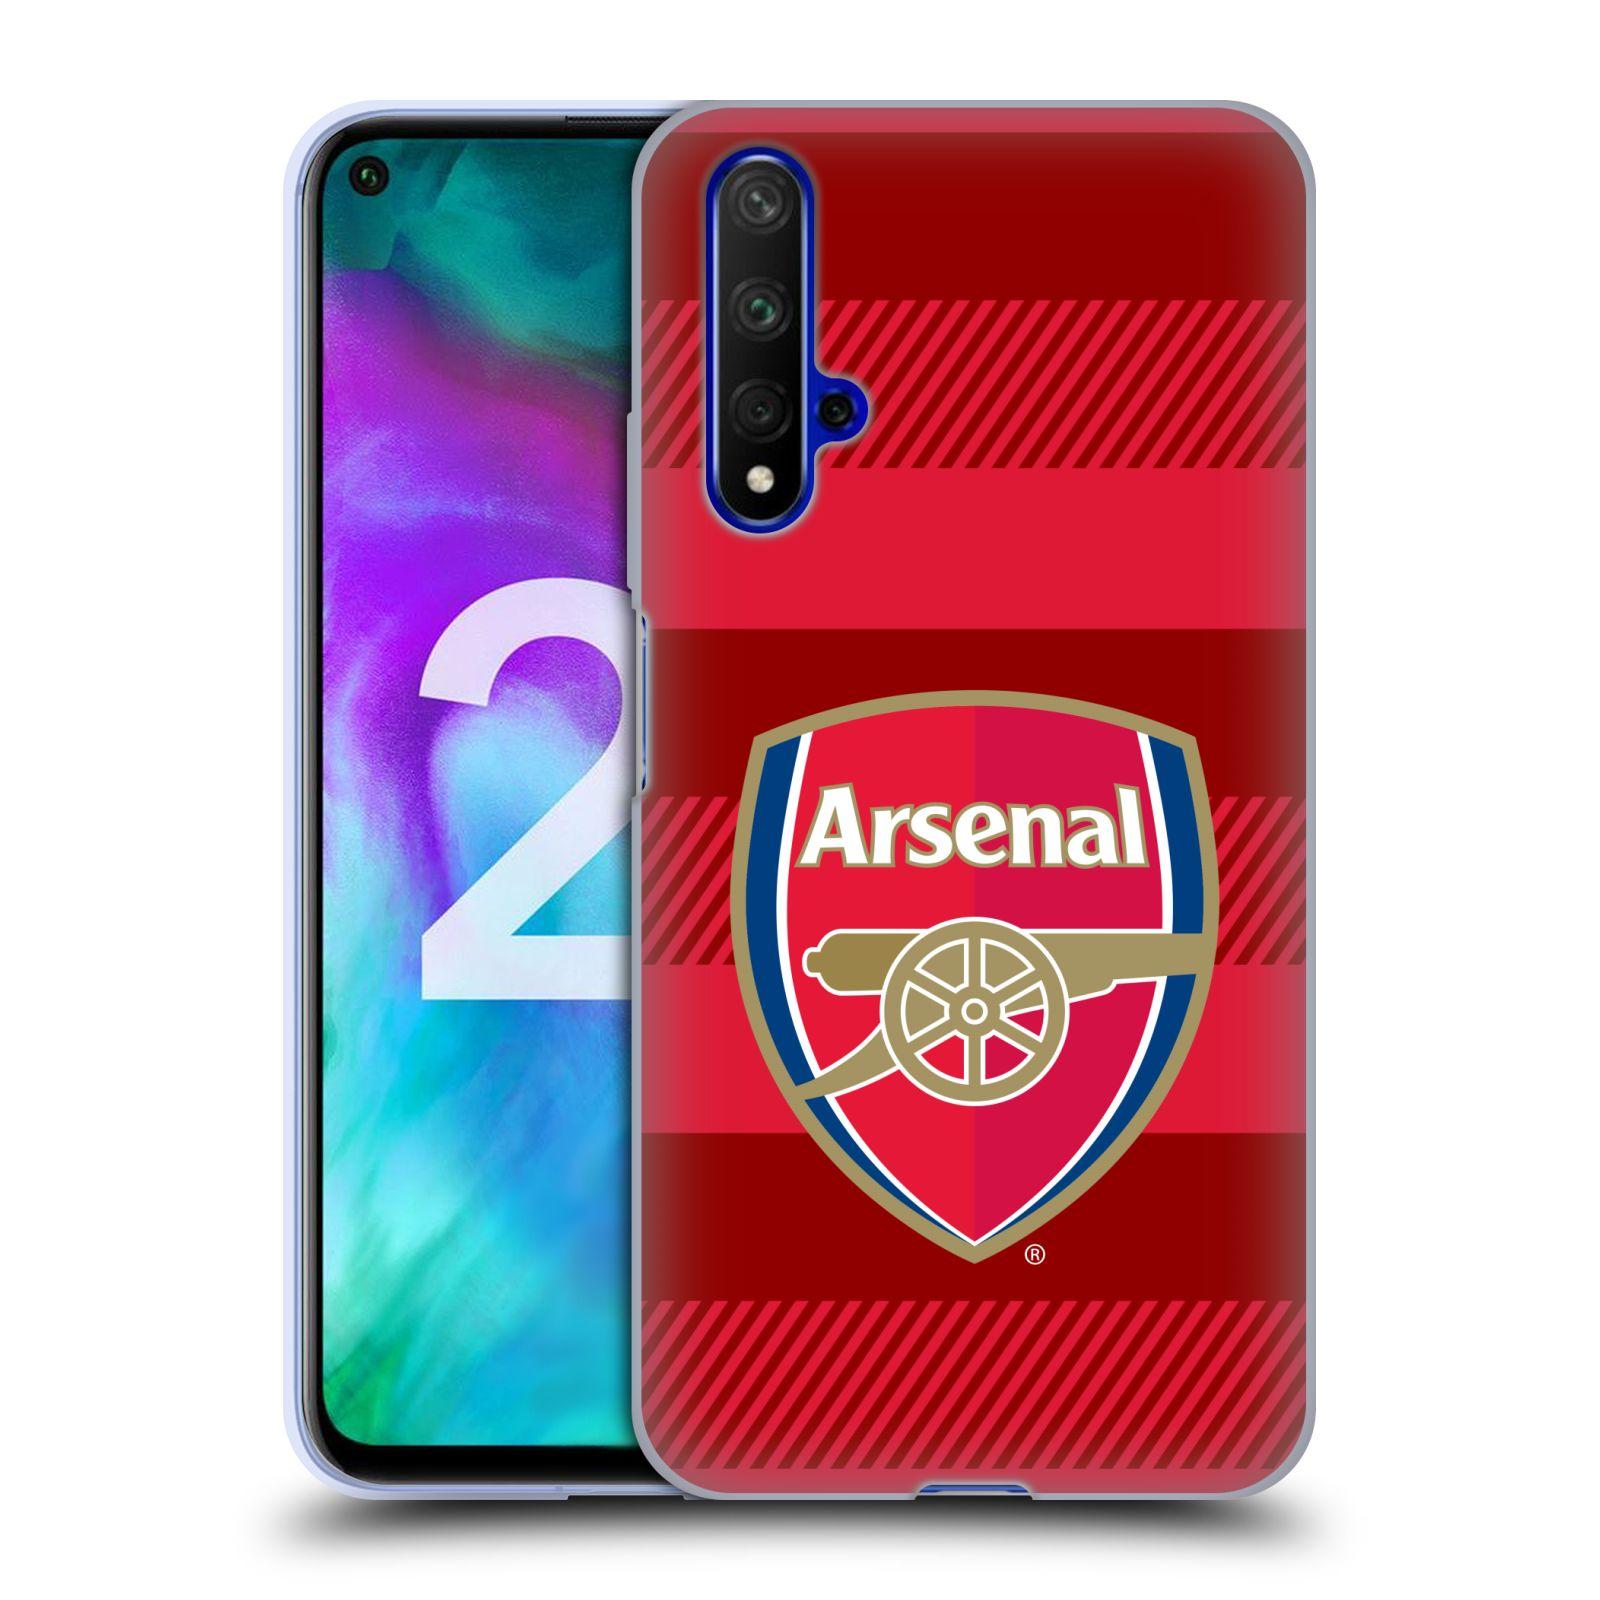 Silikonové pouzdro na mobil Honor 20 - Head Case - Arsenal FC - Logo s pruhy